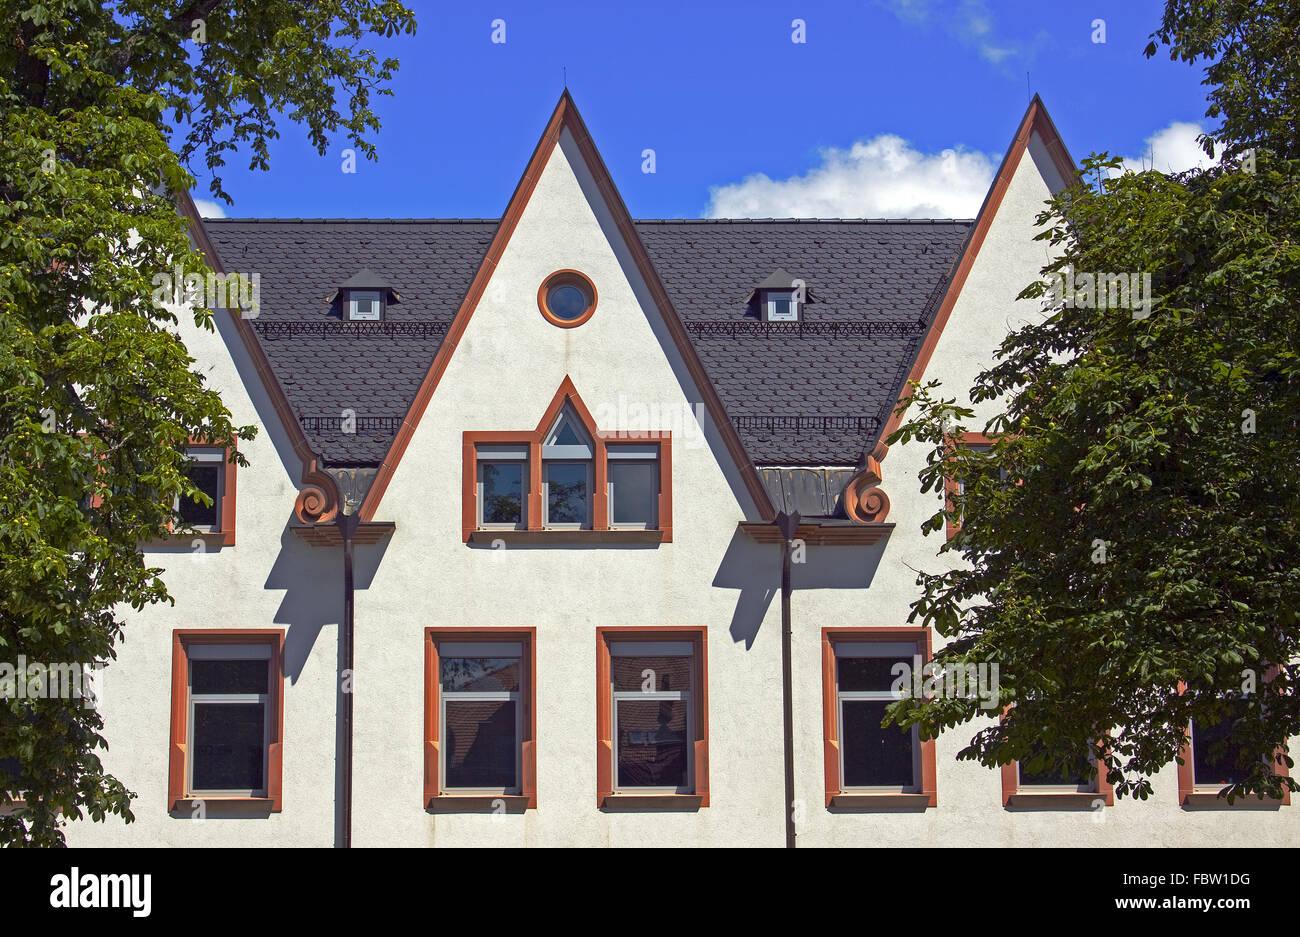 historically gable Old town Villingen - Stock Image